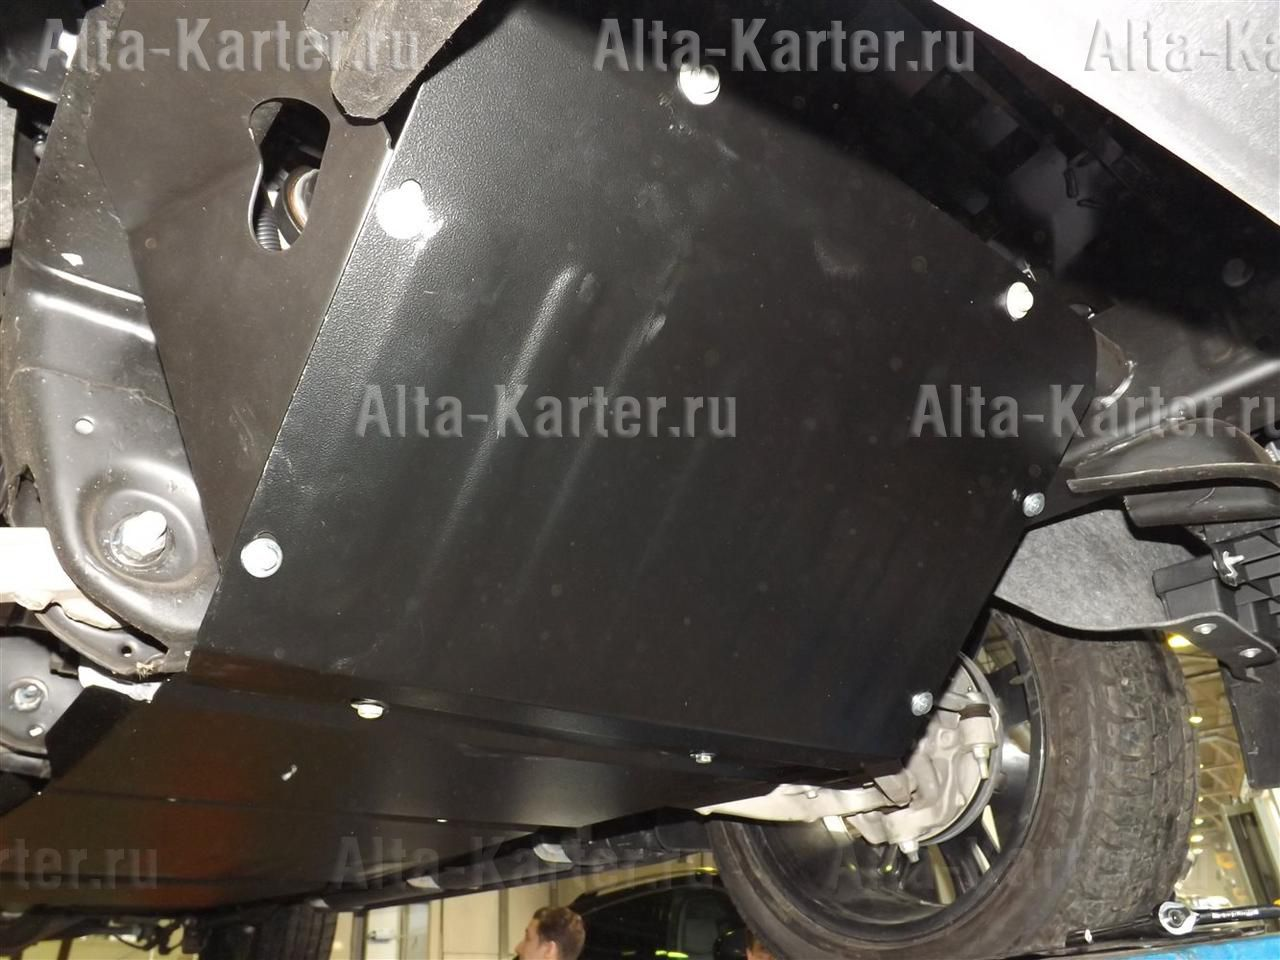 Защита Alfeco для картера (2 части) Cadillac Escalade IV 2014-2021. Артикул ALF.37.06